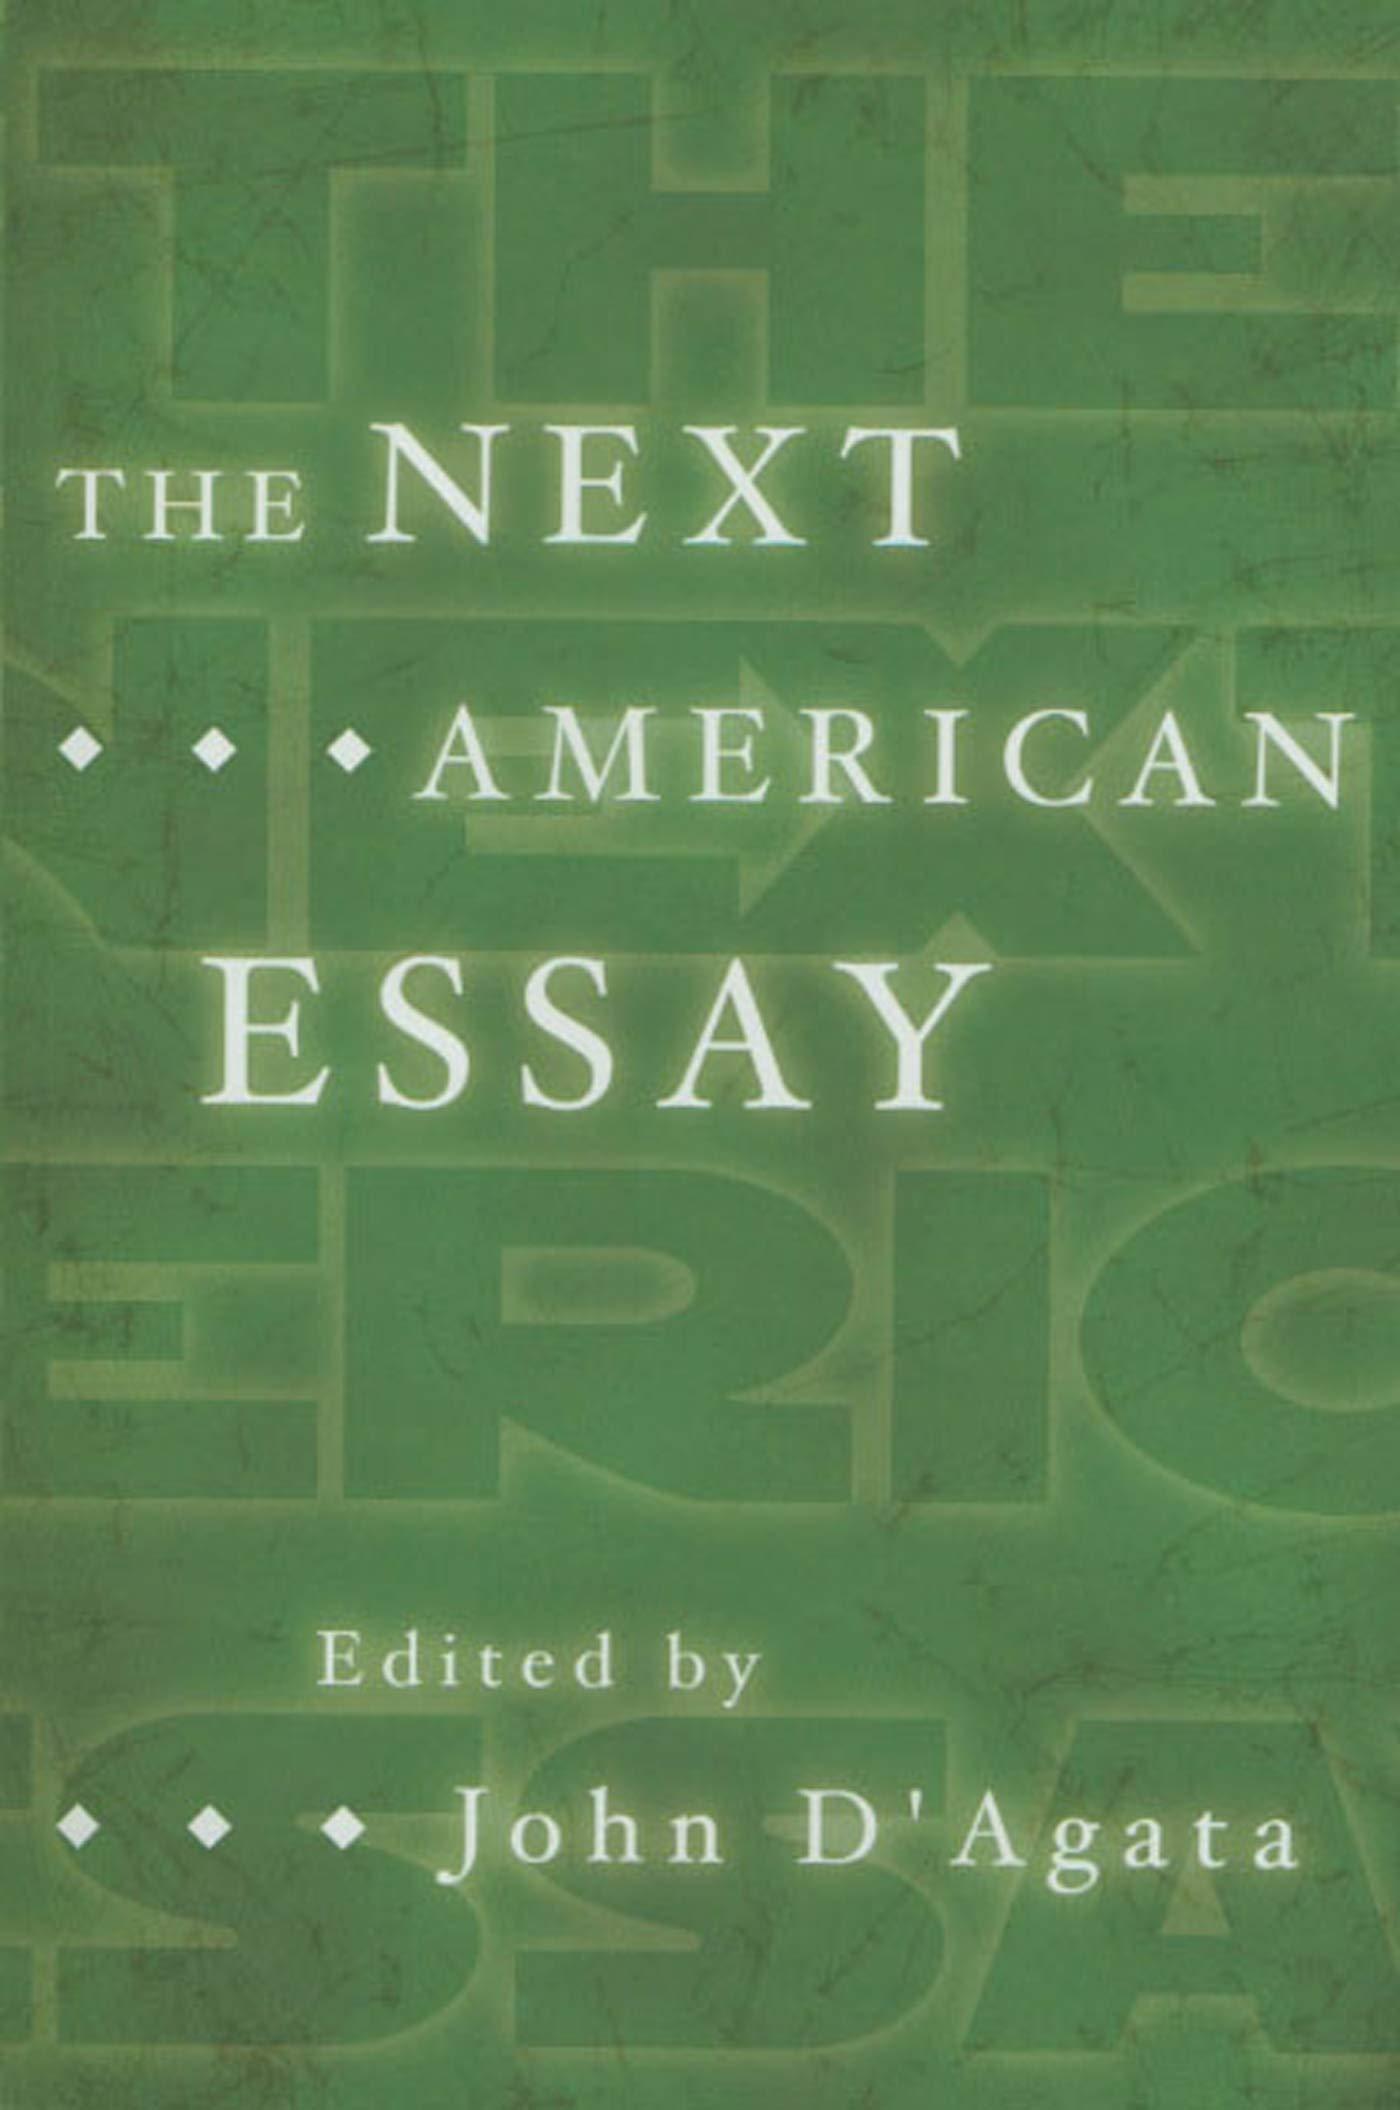 024 61uwmdqvqdl American Essay Striking Best Writers Creed Contest Identity Titles Full